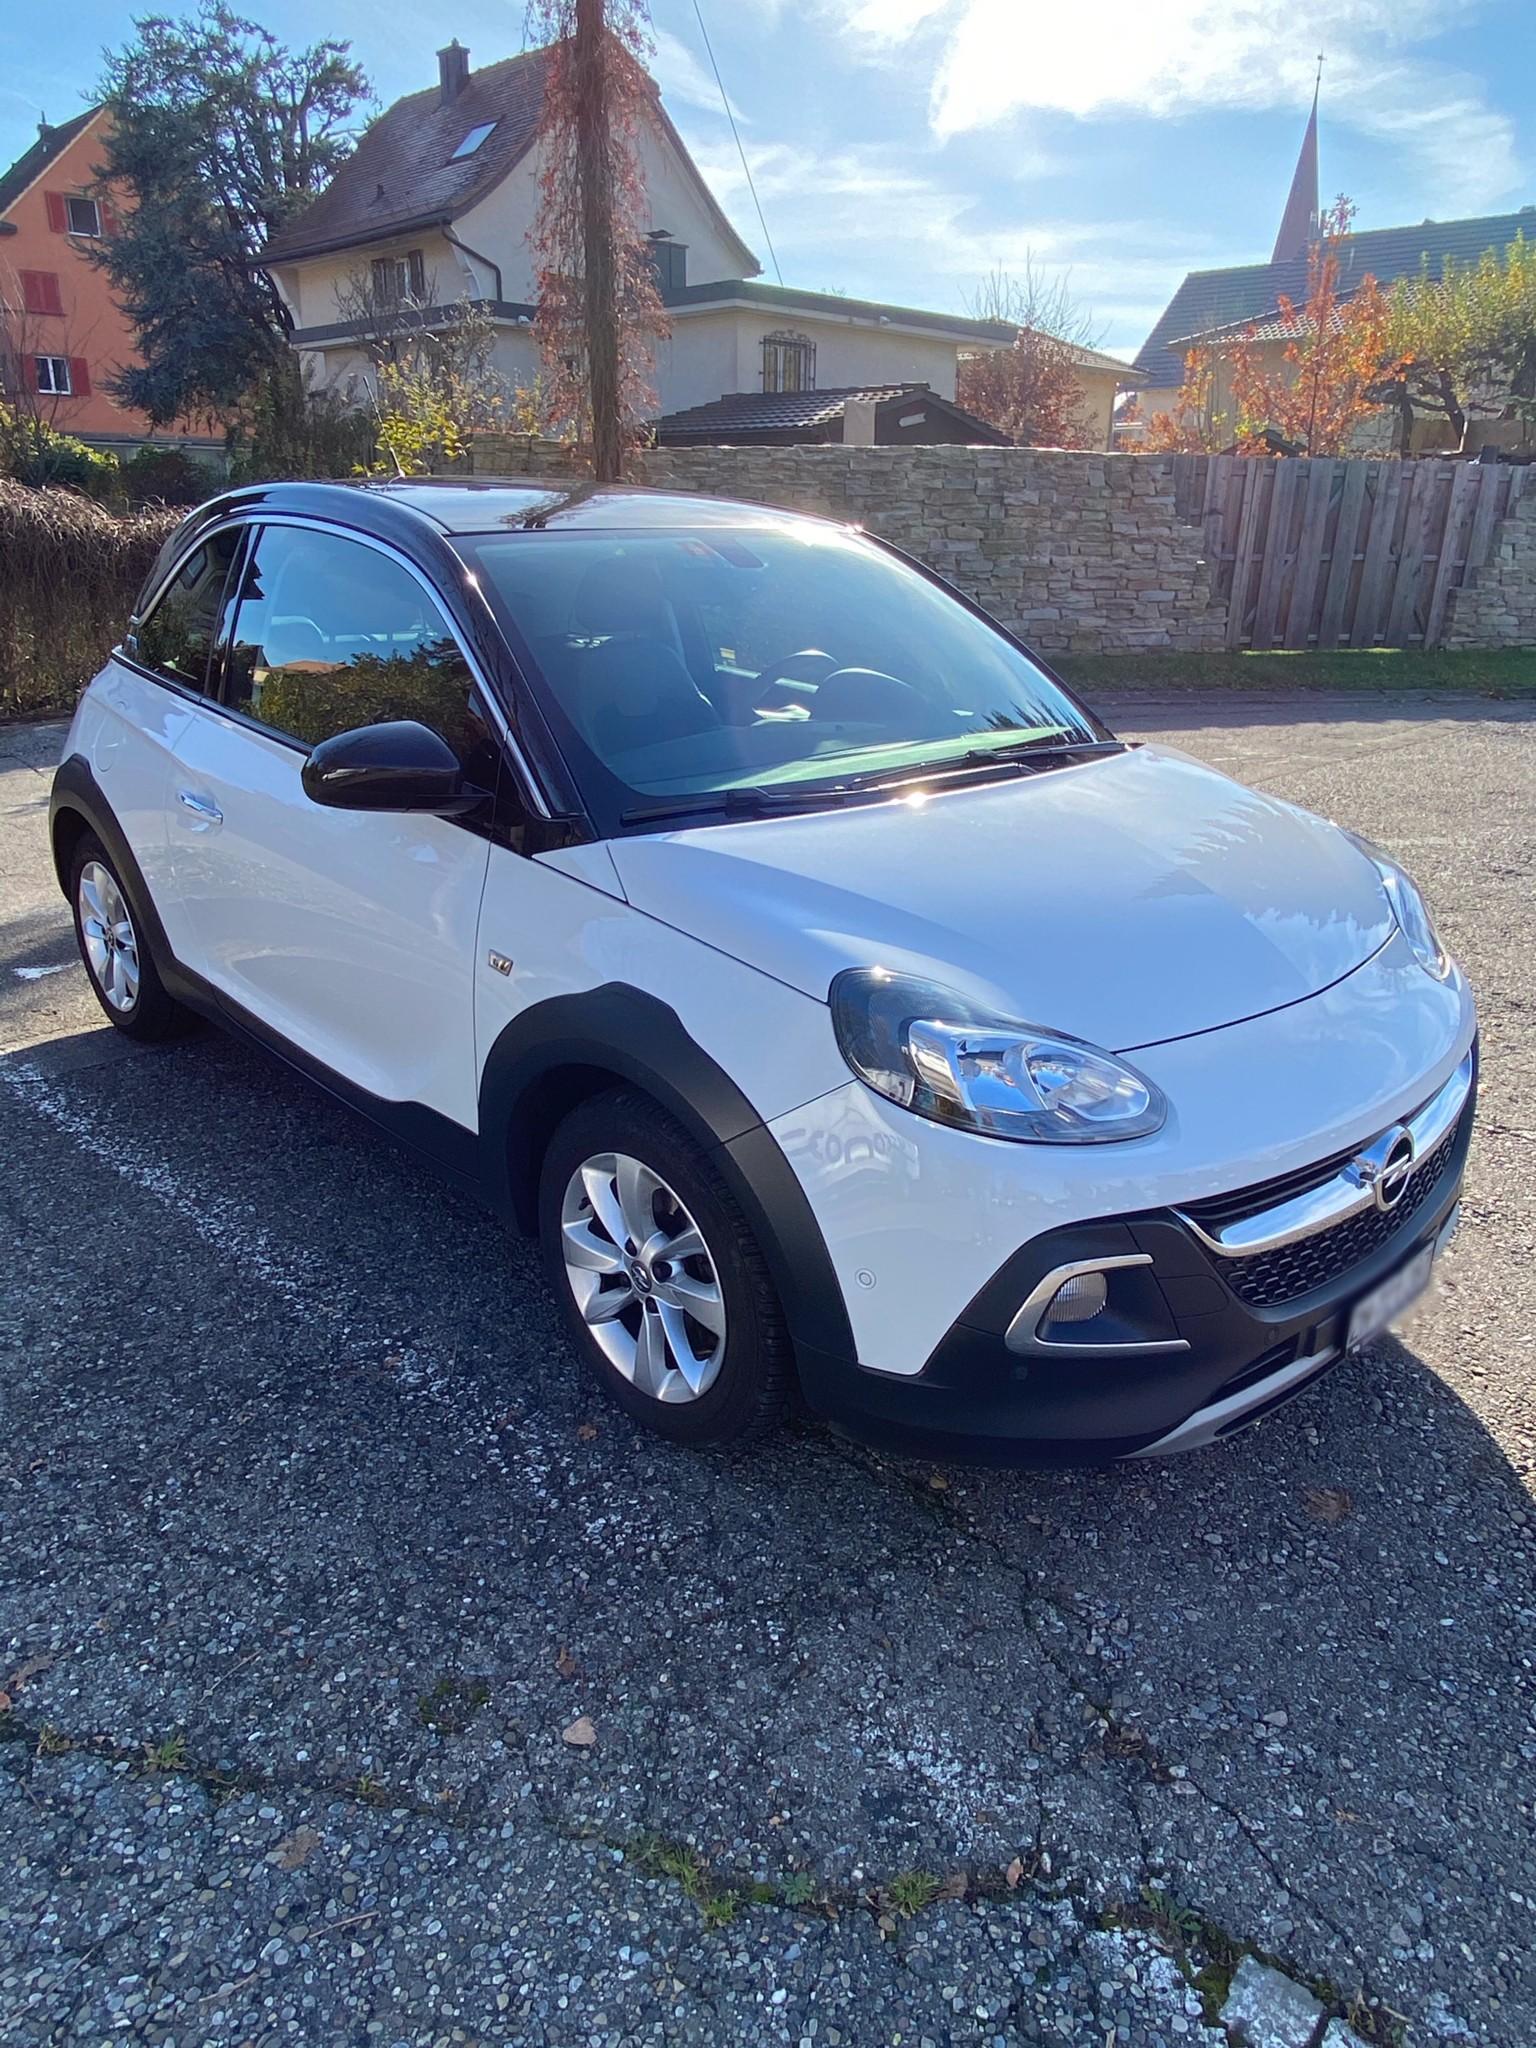 Buy Sedan Opel Adam Rocks Im Top Zustand 50000 Km At 11900 Chf On Carforyou Ch